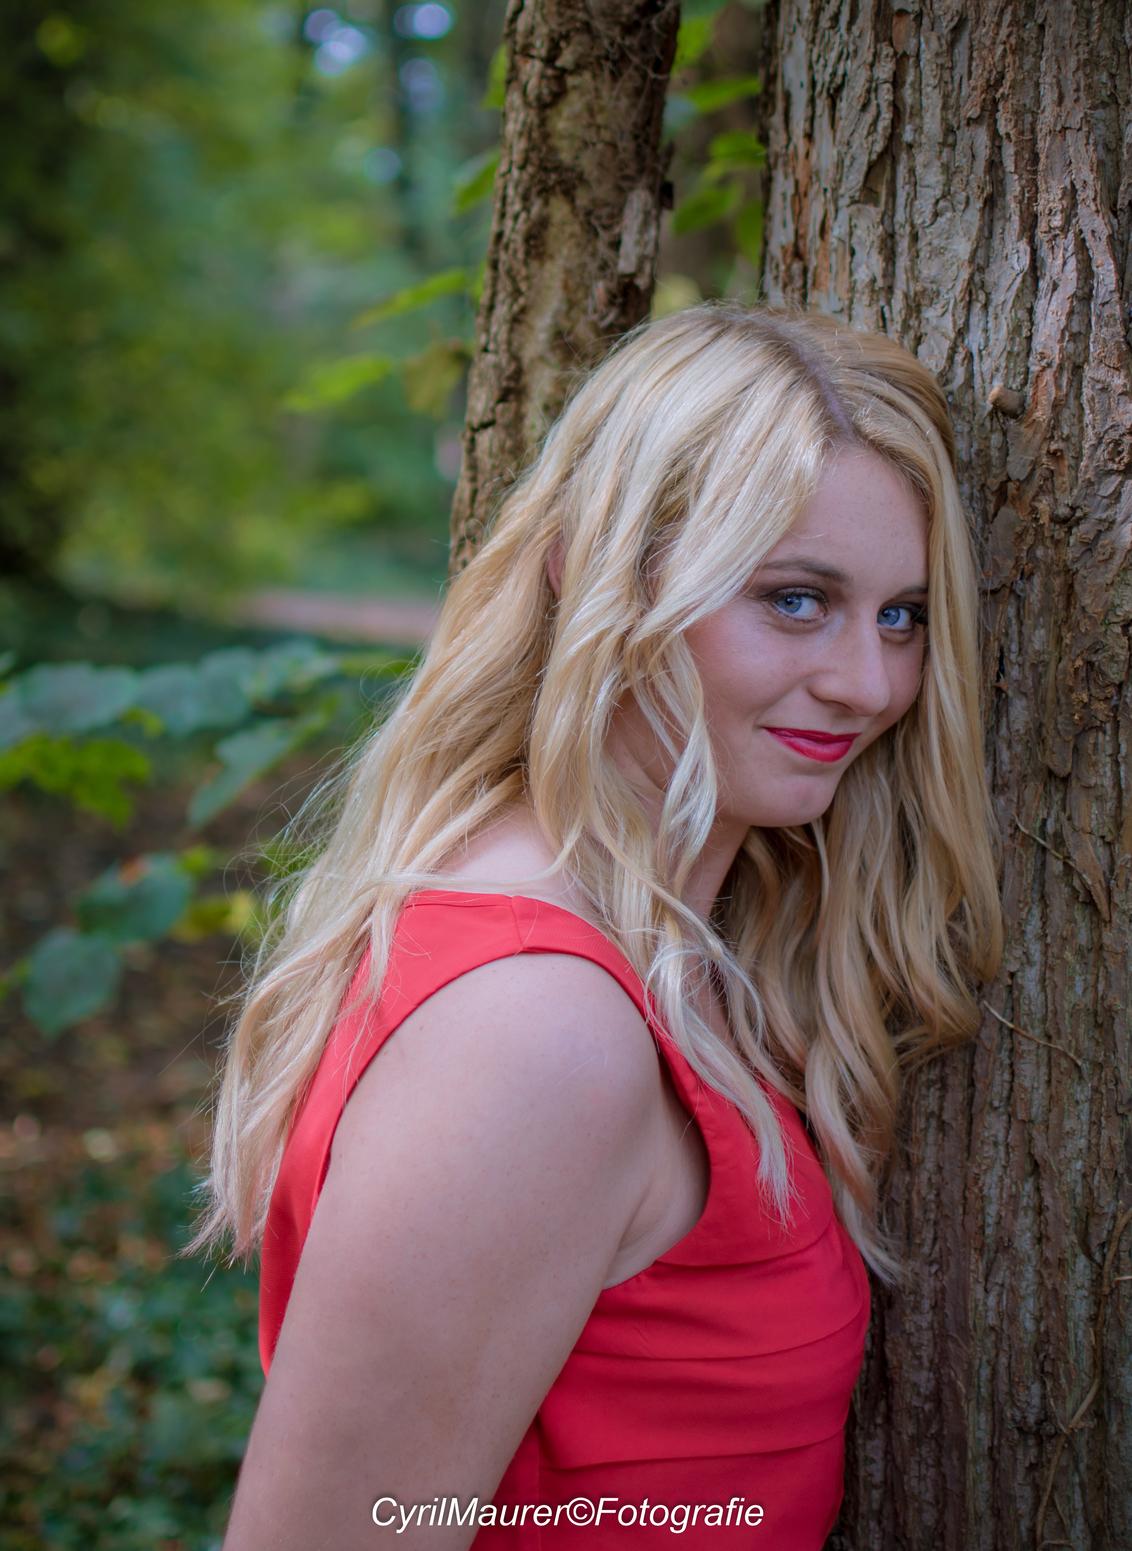 Anouk in love wtih the tree - Model : Anouk Janssen Mauh : Shannen Trines Fotograaf : Cyril Maurer - foto door sipmaurer op 03-11-2016 - deze foto bevat: vrouw, licht, portret, schaduw, model, daglicht, ogen, haar, beauty, blond, mode, 35mm